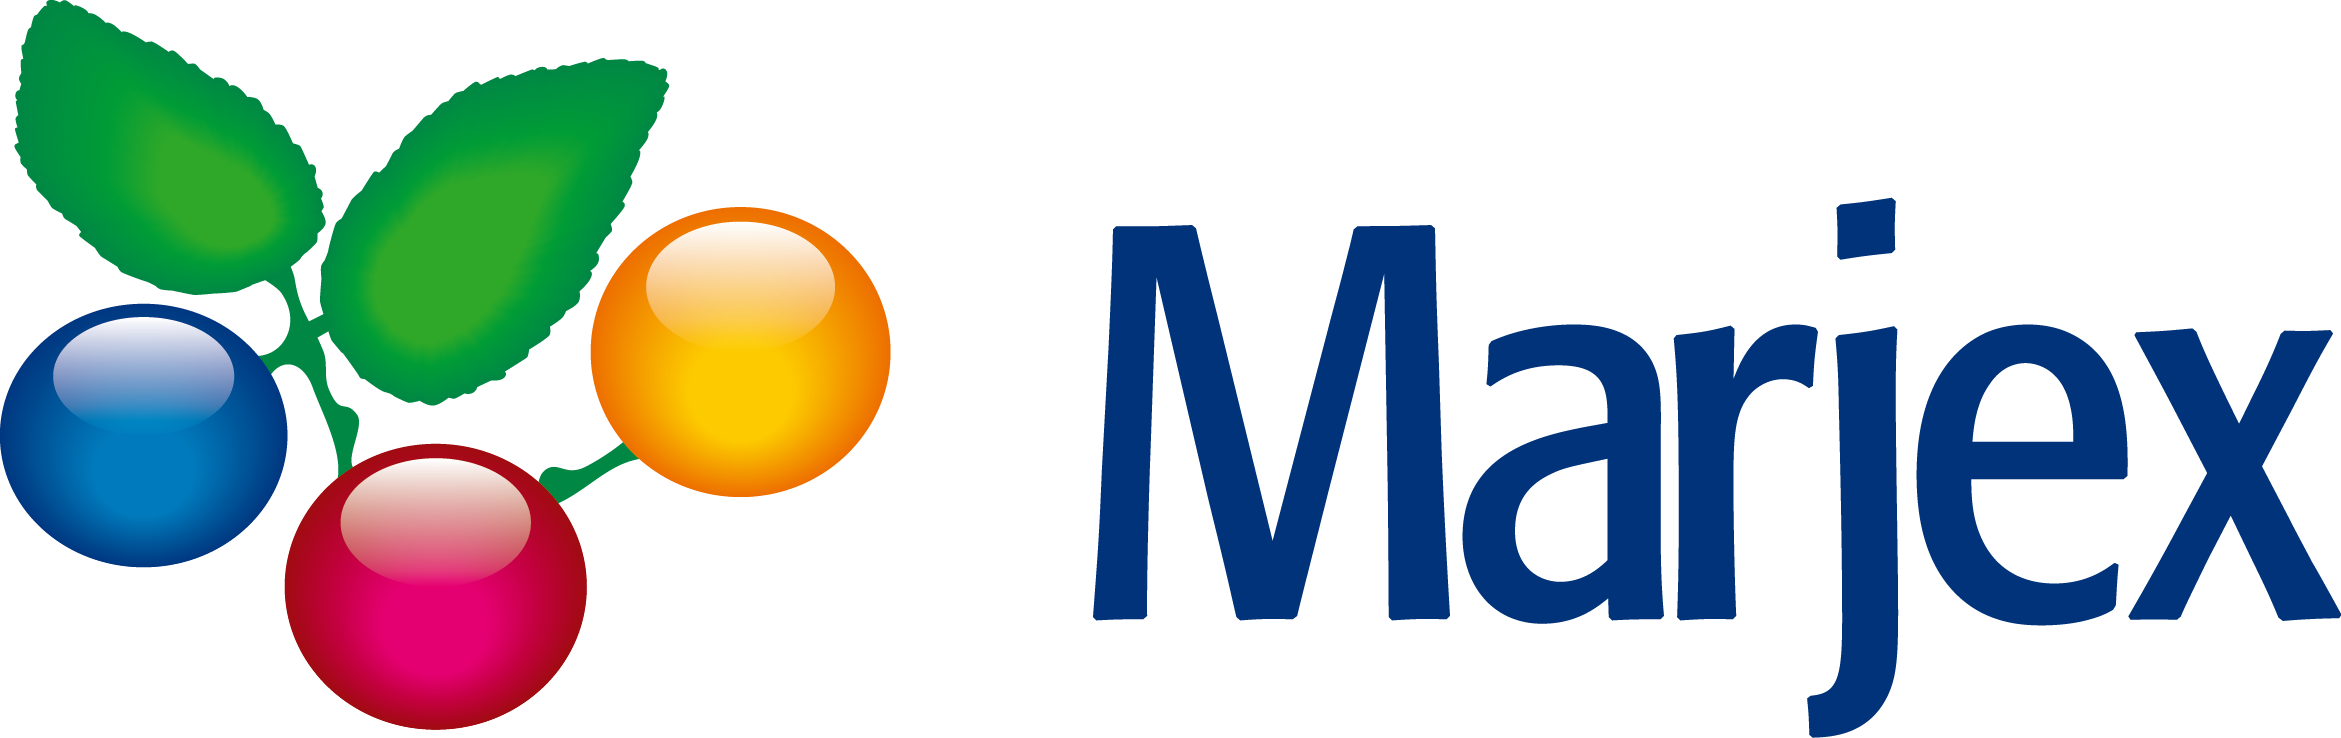 Marjex -ostopisteet